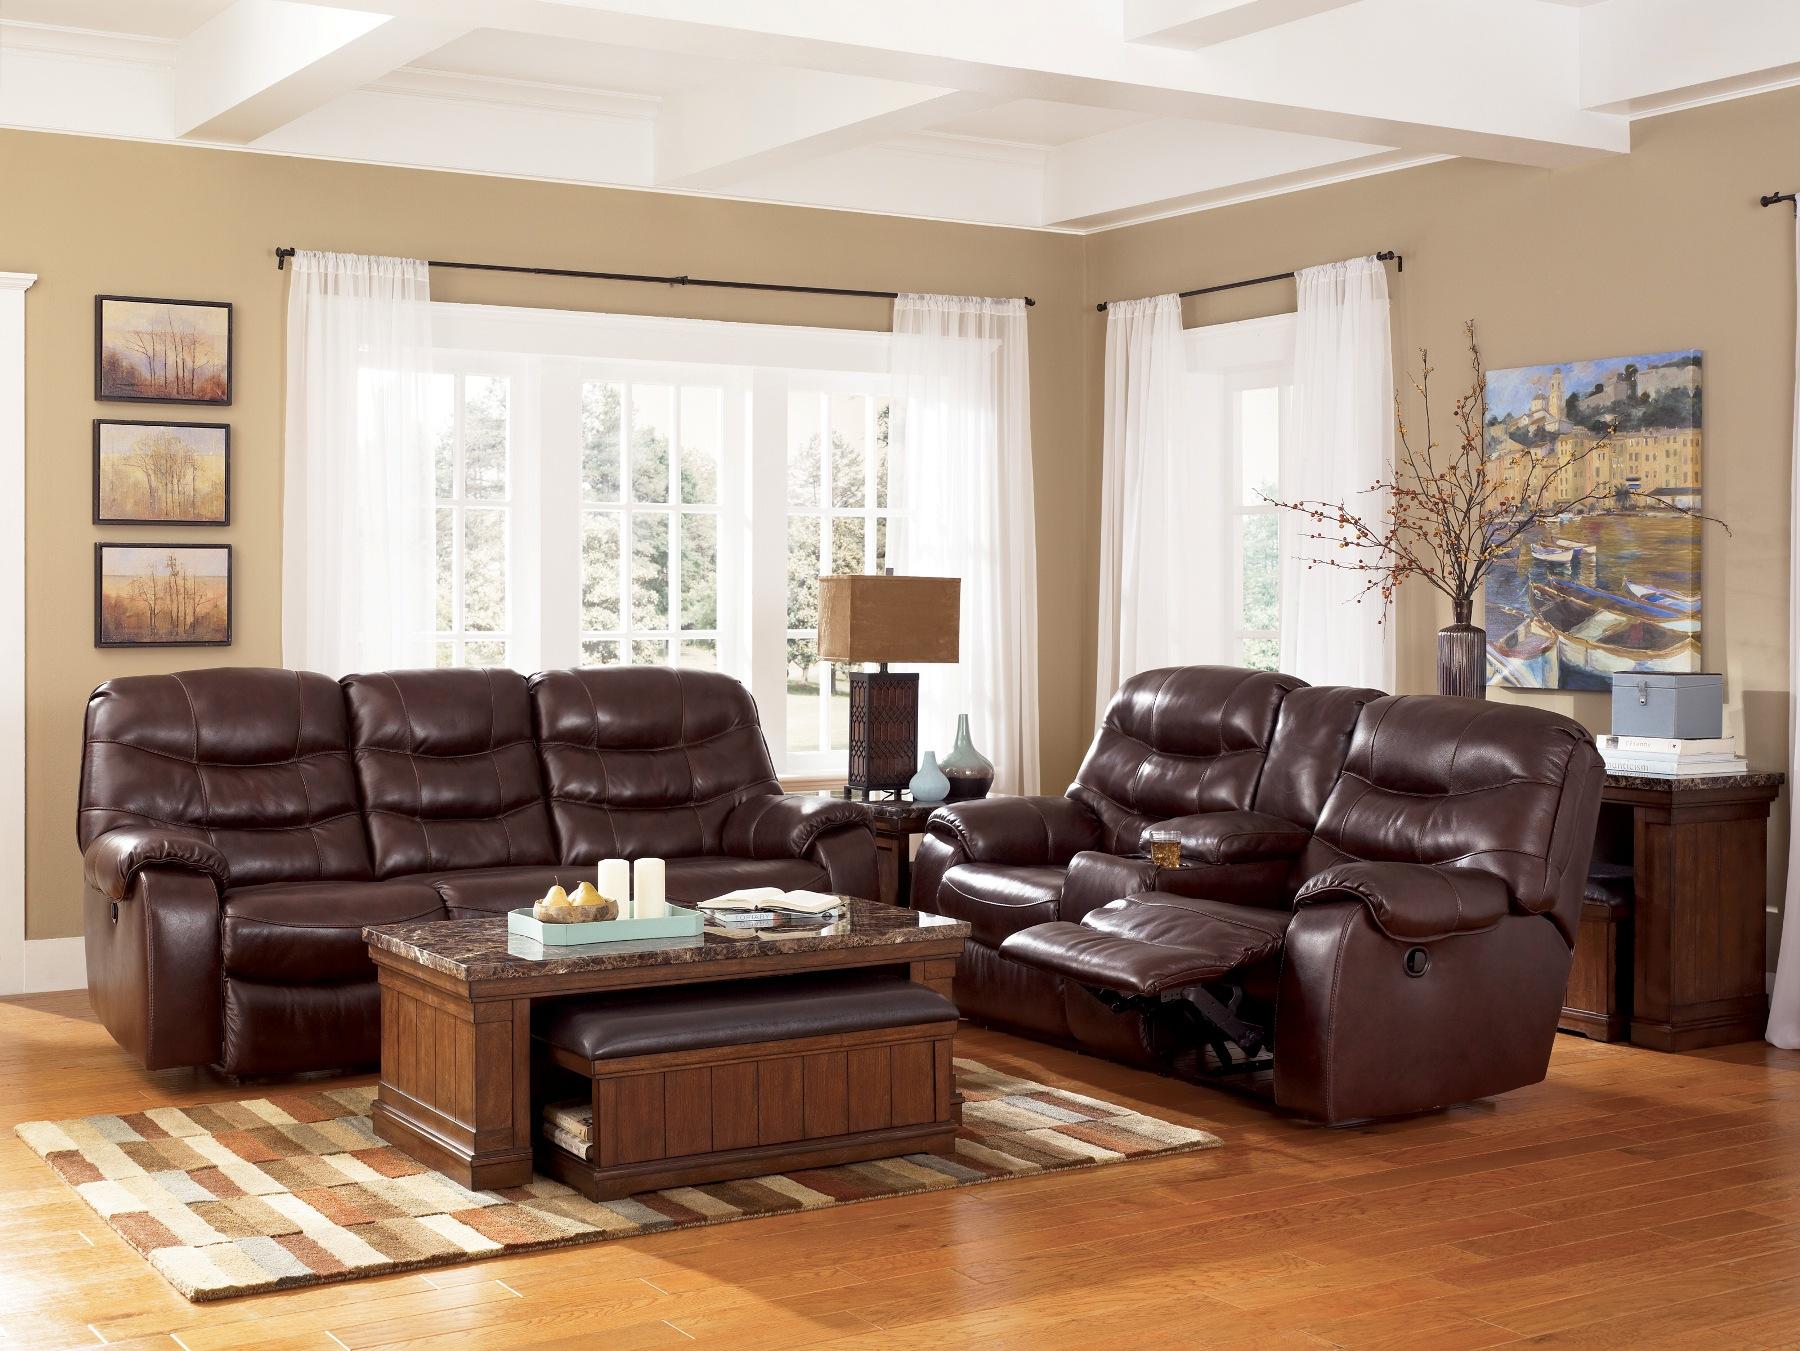 Furniture > Living Room Furniture > Pad > Vinyl Pad